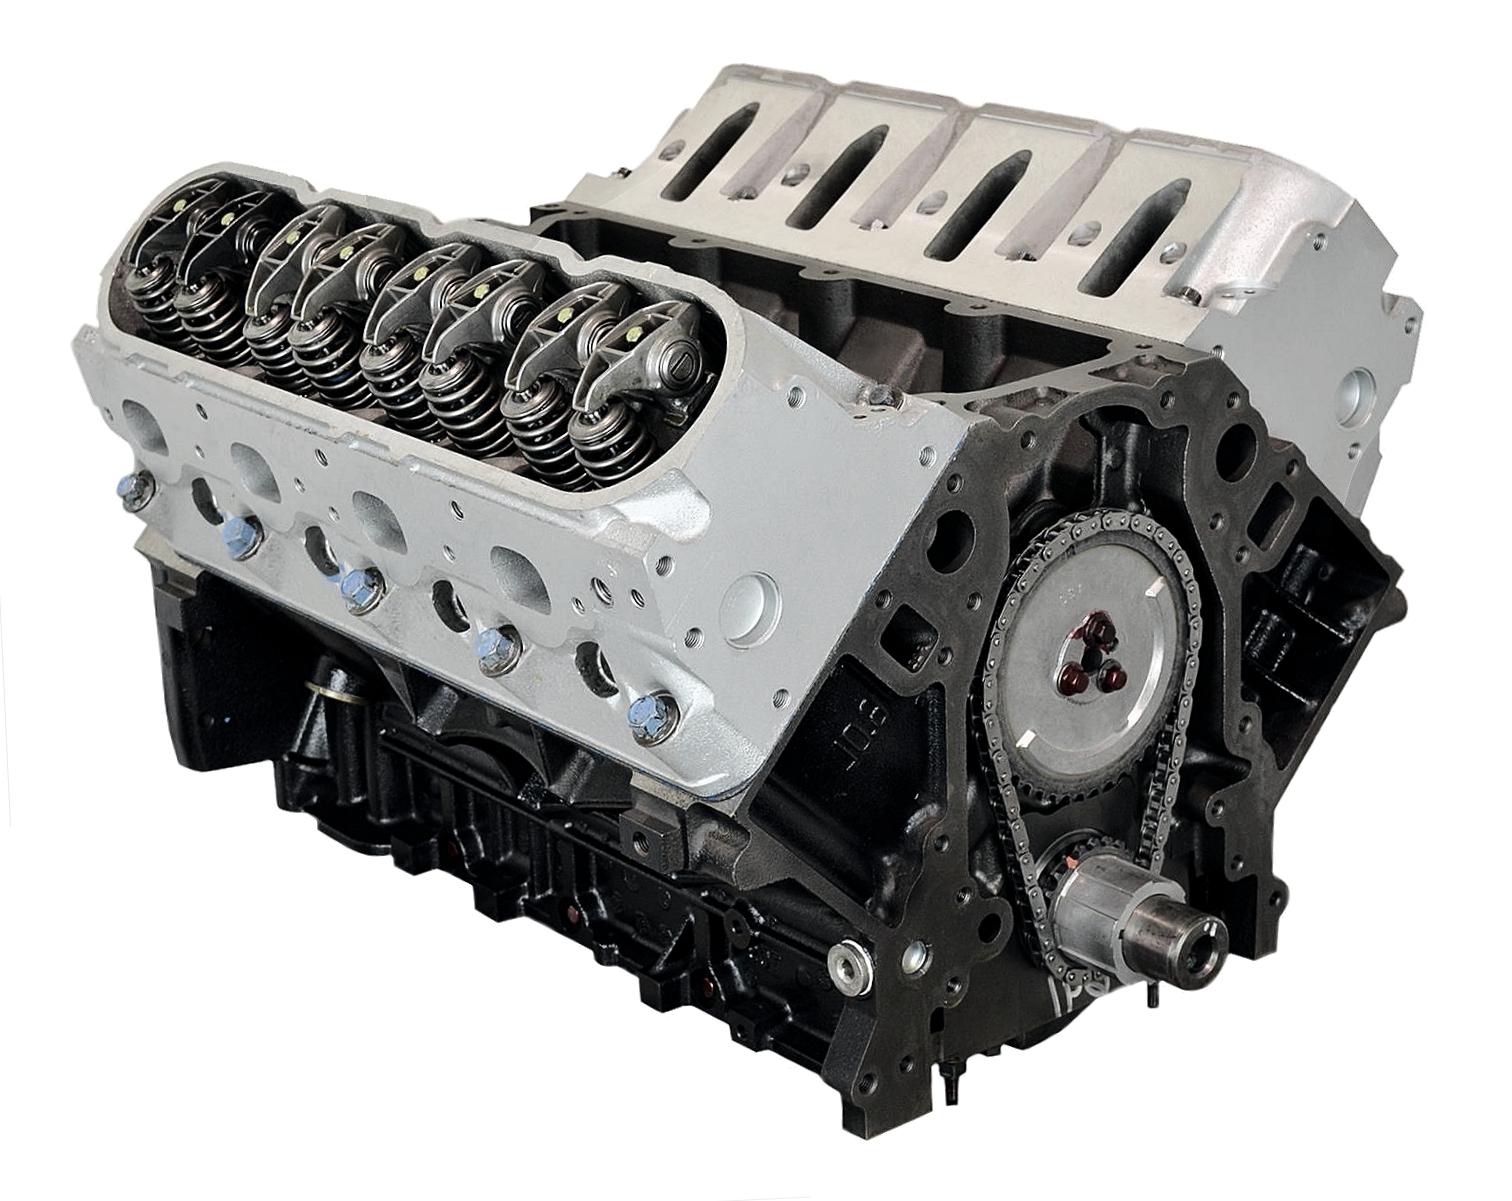 GMC Yukon - 5.3 L59 Engine - 2002-2006 (Vin Code: Z)